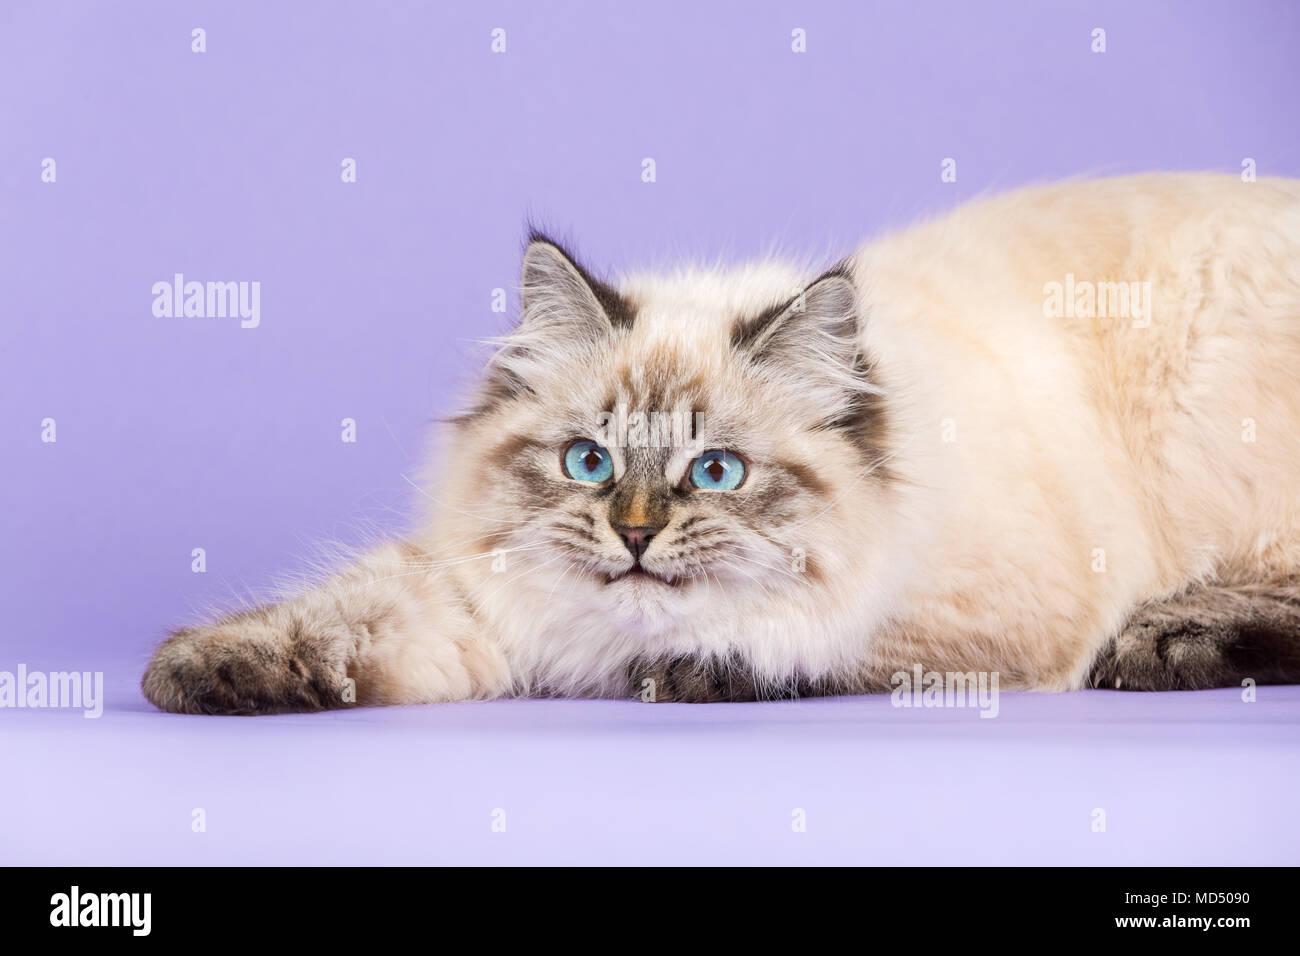 Playful Siberian cat portrait on purple - Stock Image